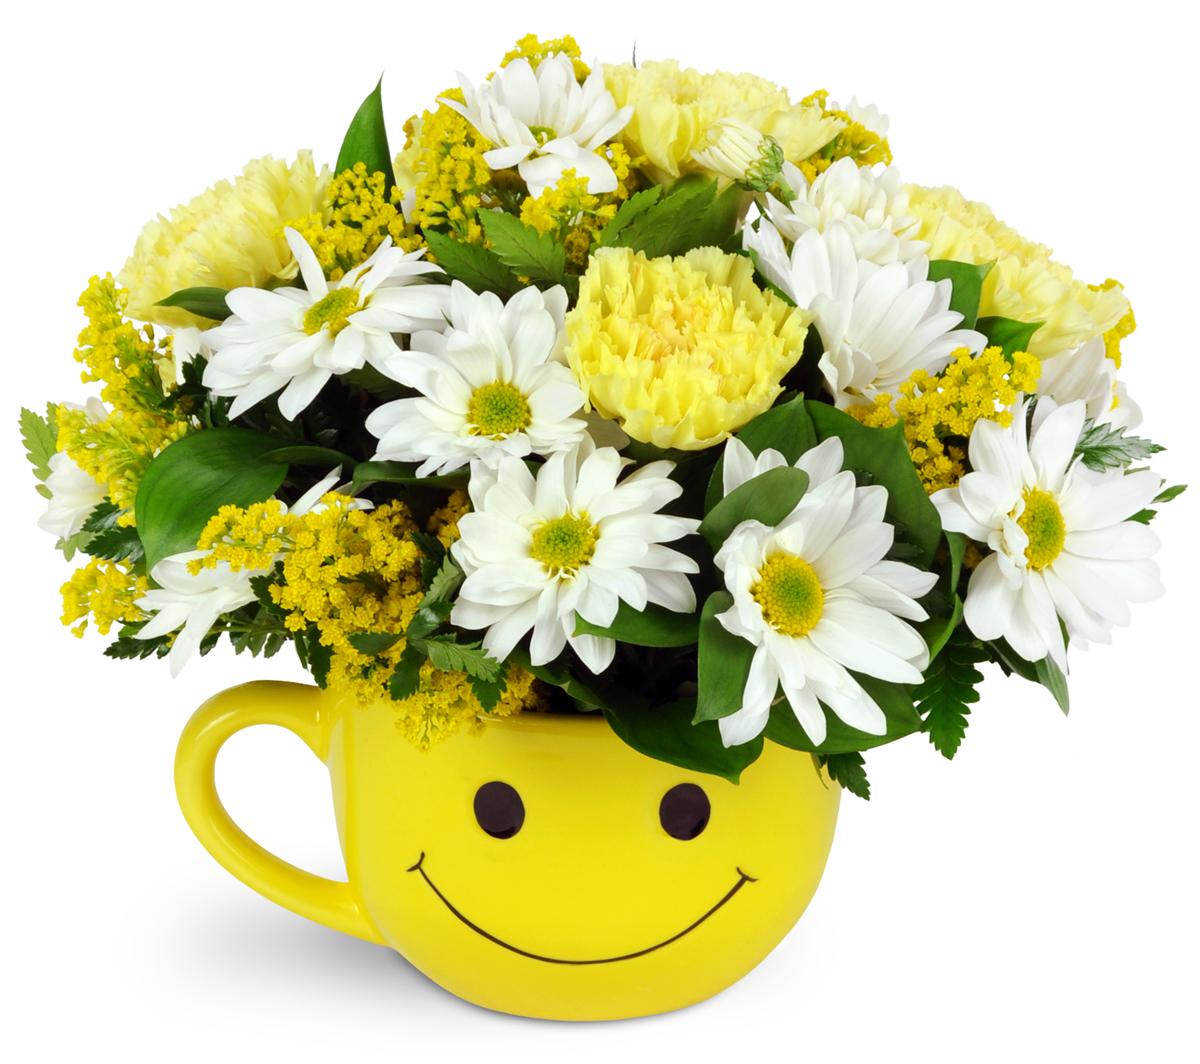 Full of smiles whitby on florist izmirmasajfo